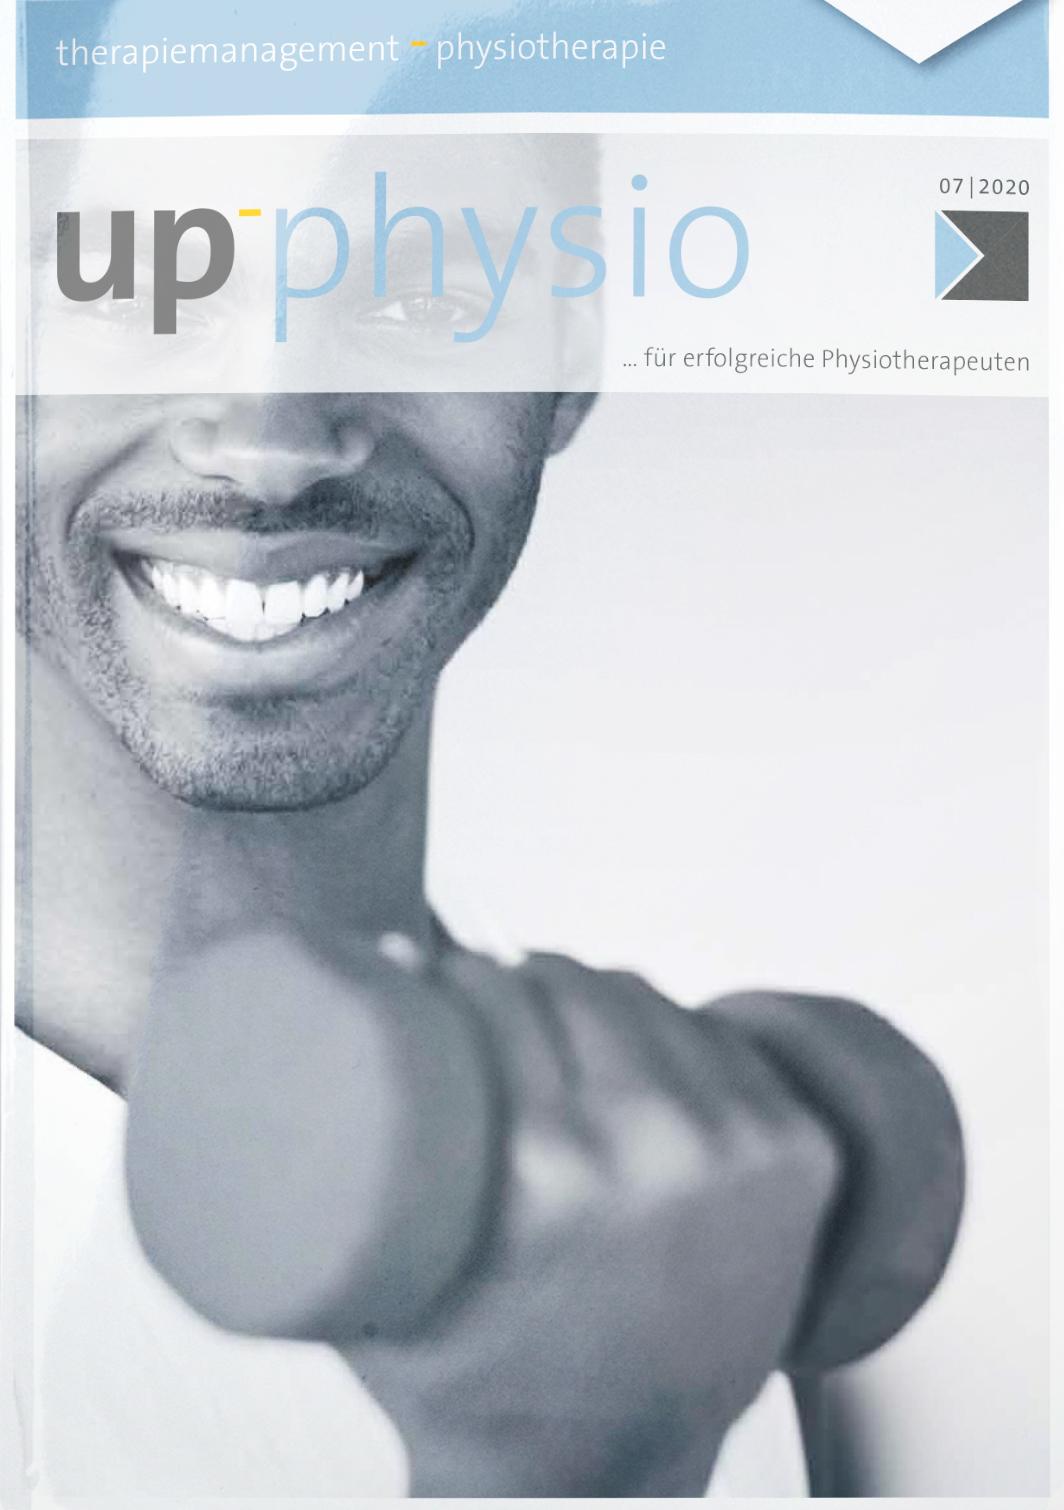 up_physio 07/2020